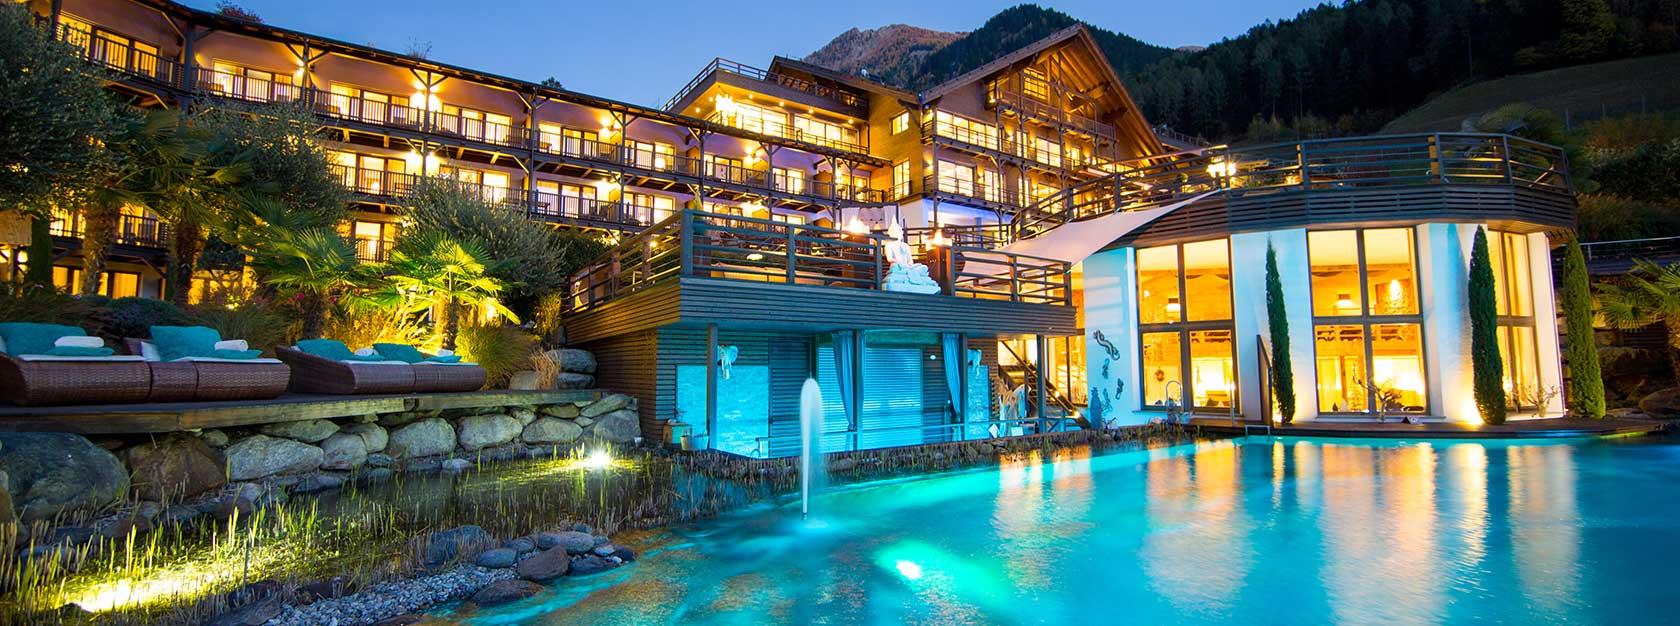 Bestes Hotel Der Welt  Sterne